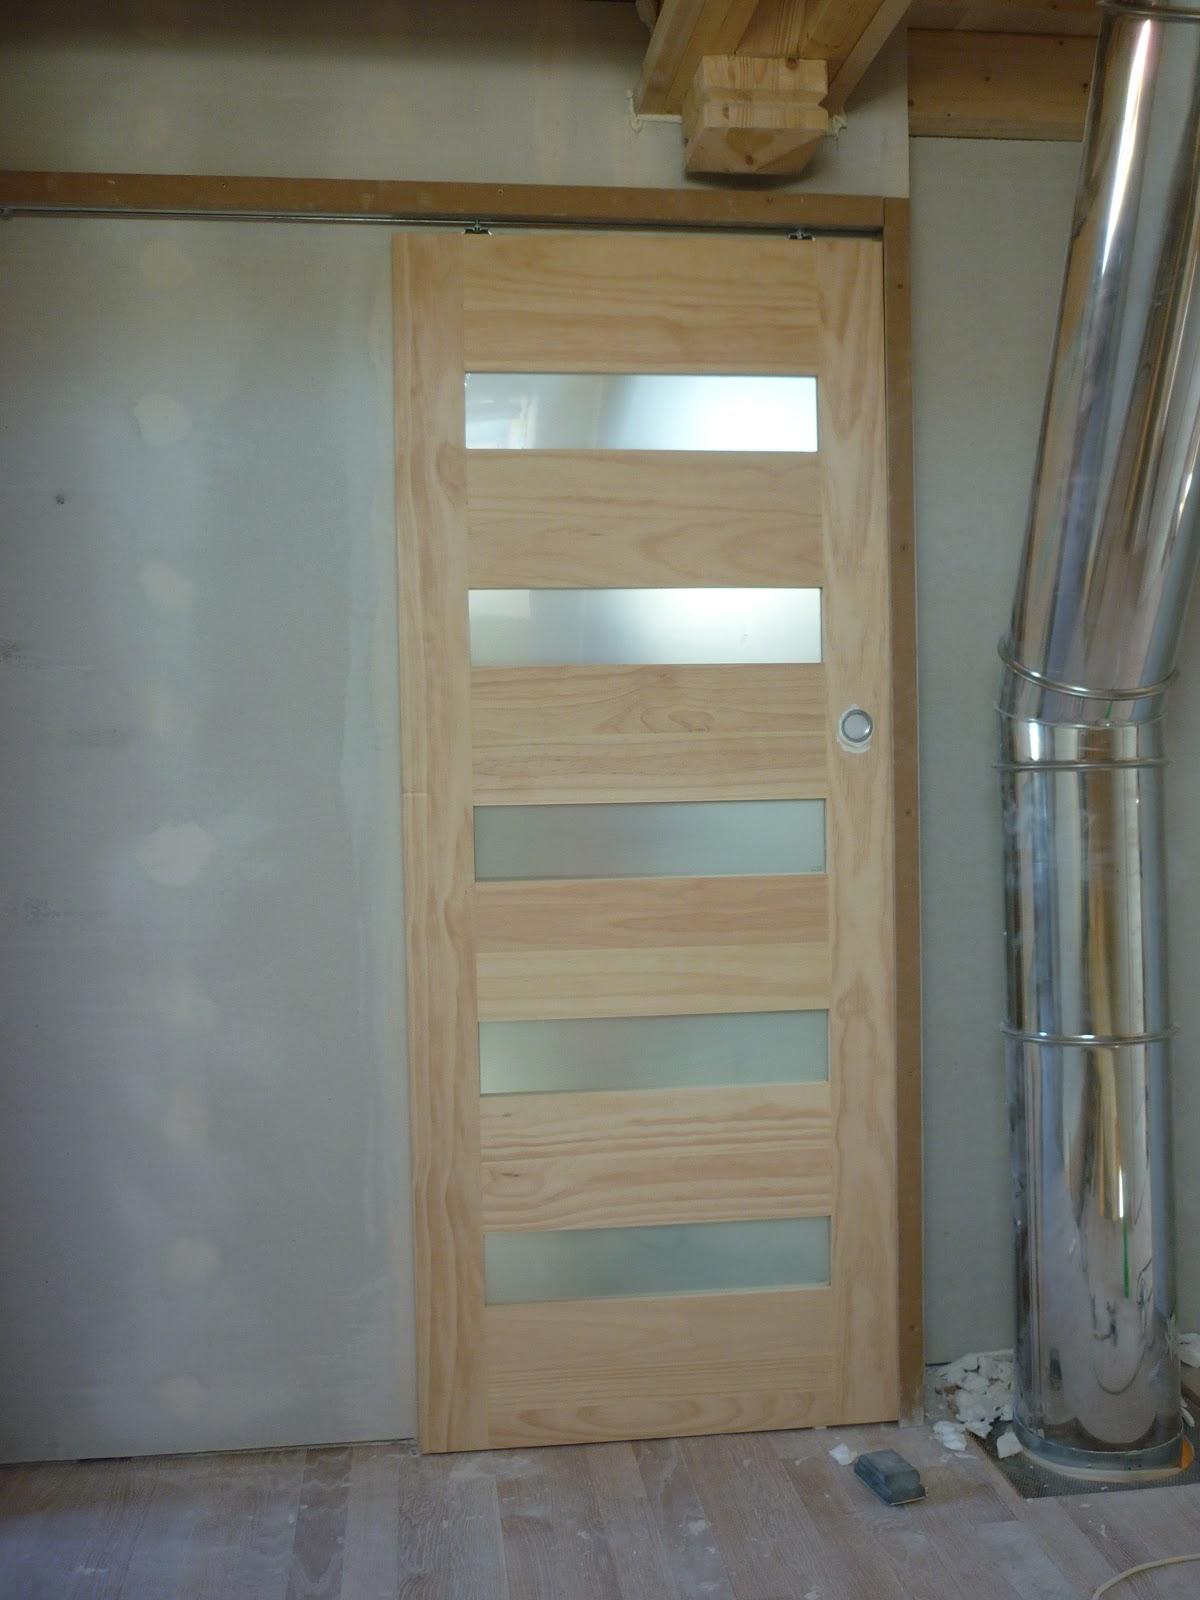 Construction de notre maison agnos salle de bain 1 for Portes salle de bain